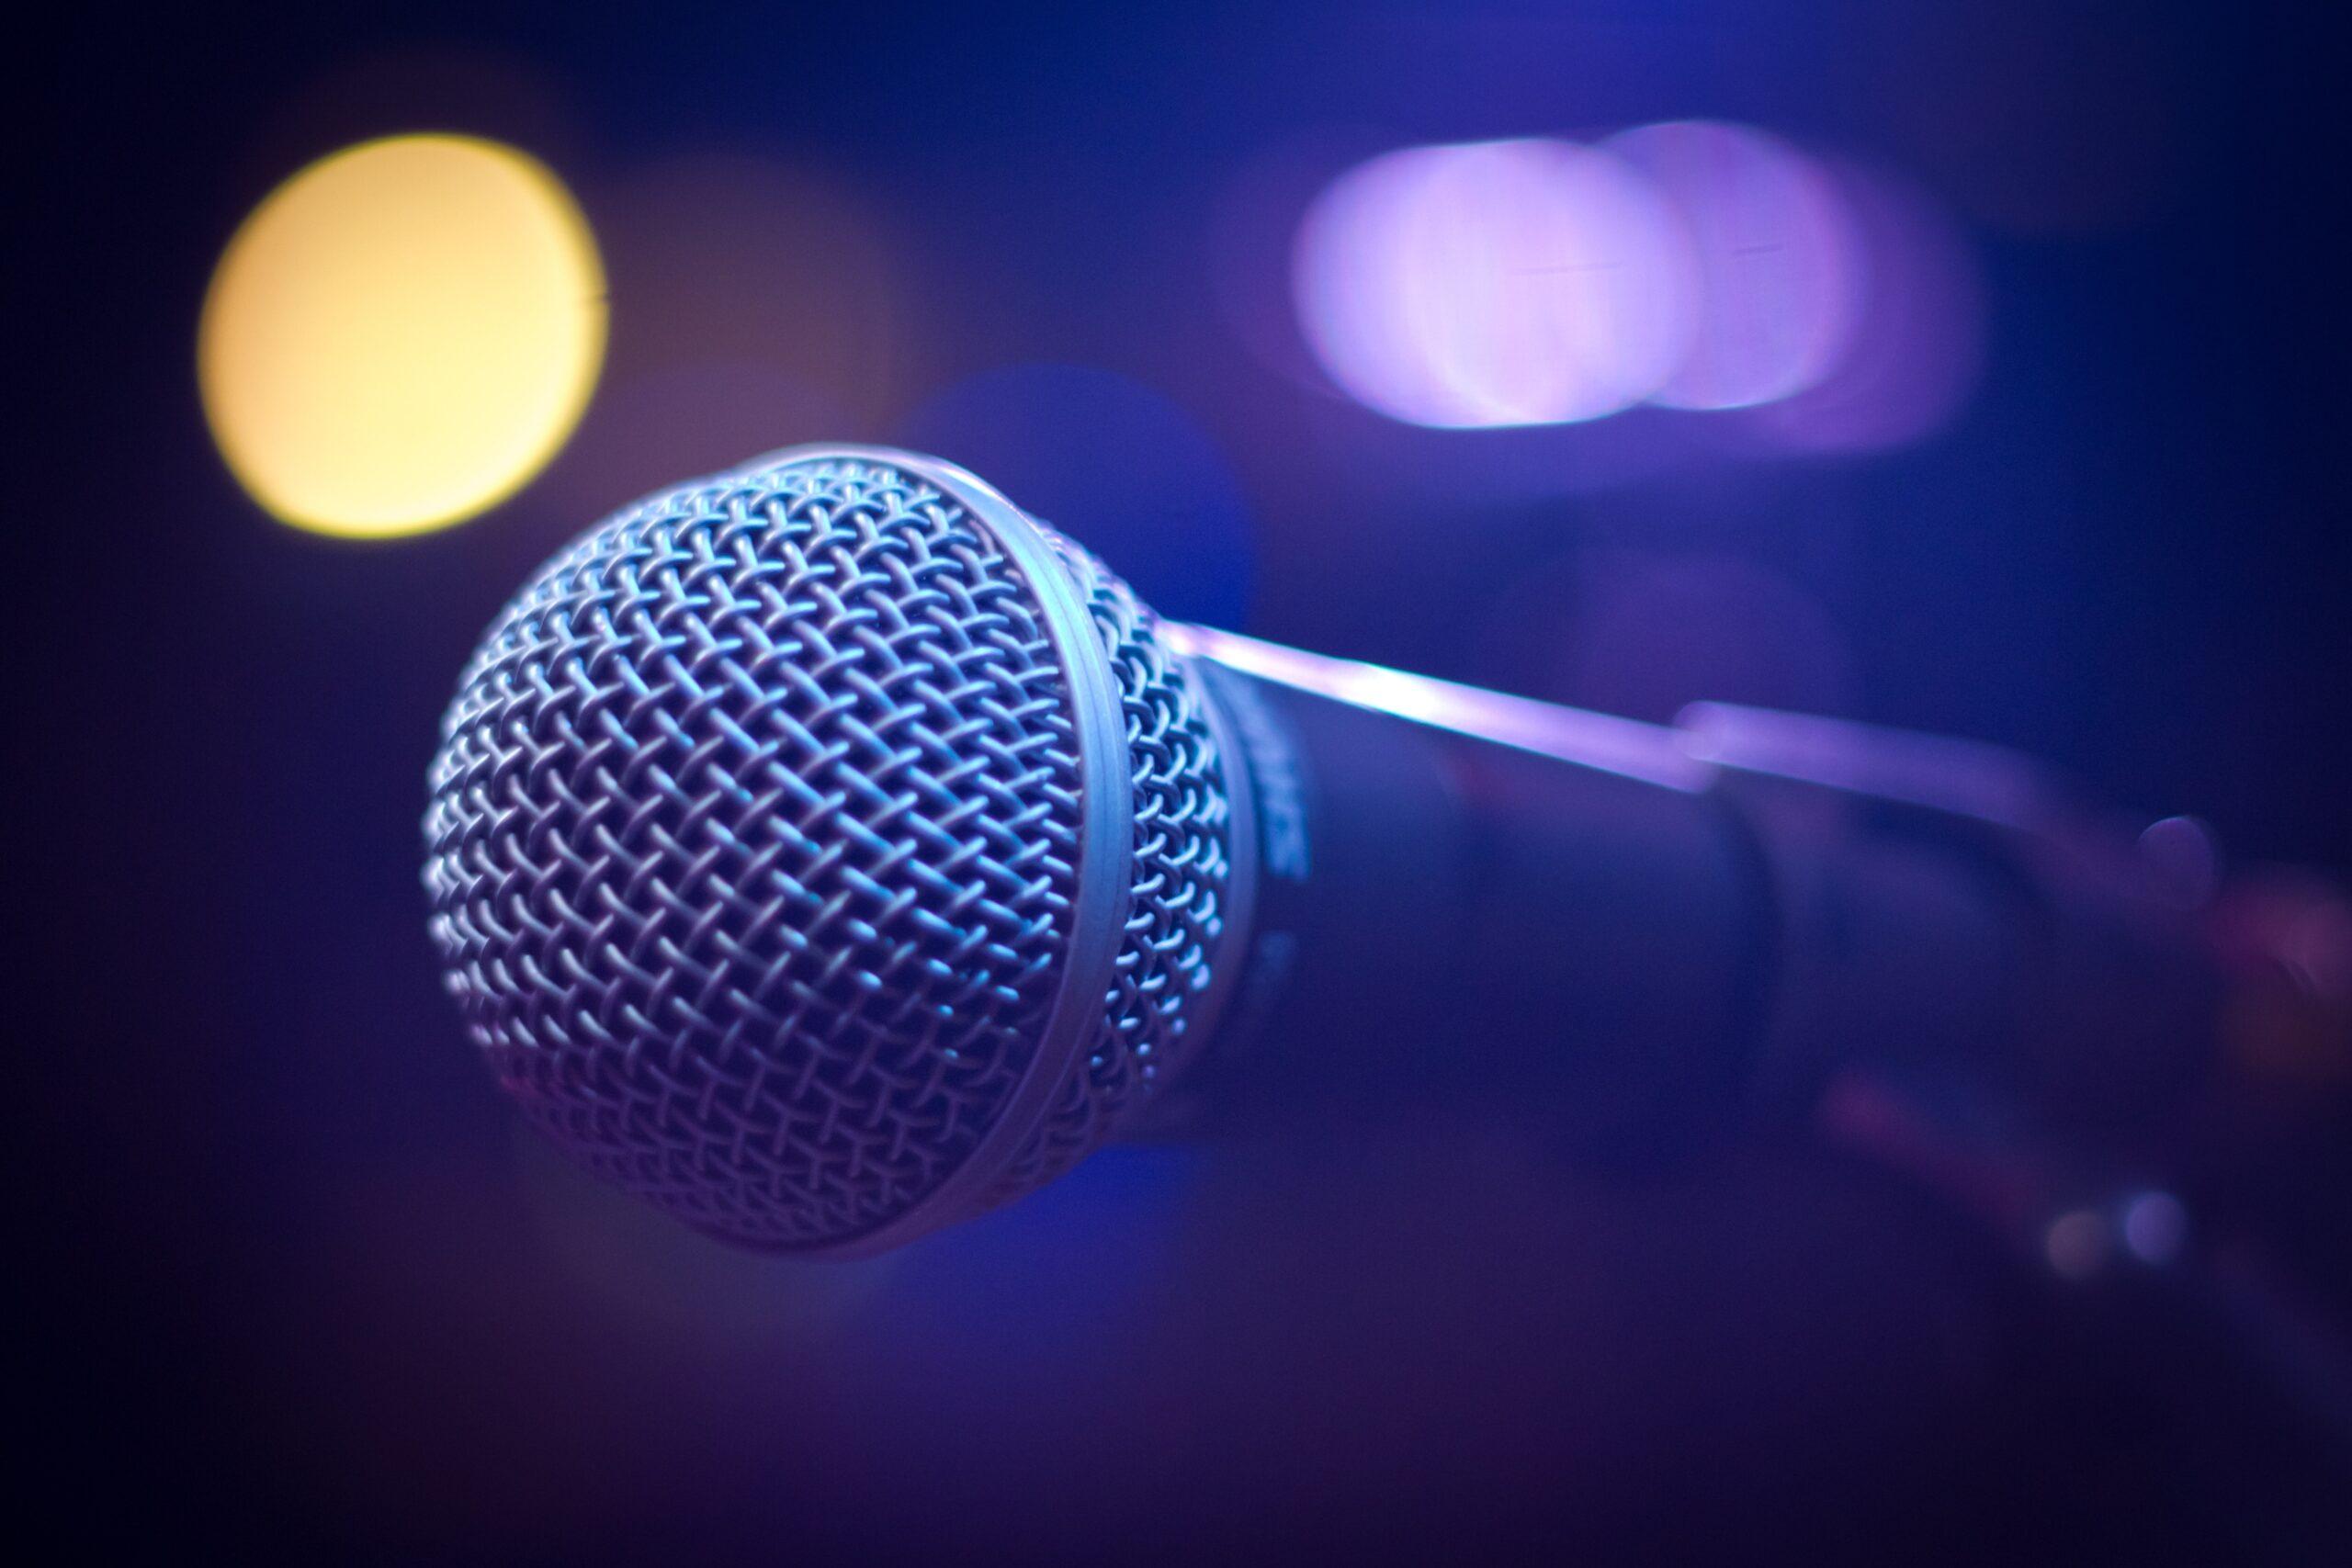 microfon-dictate-text